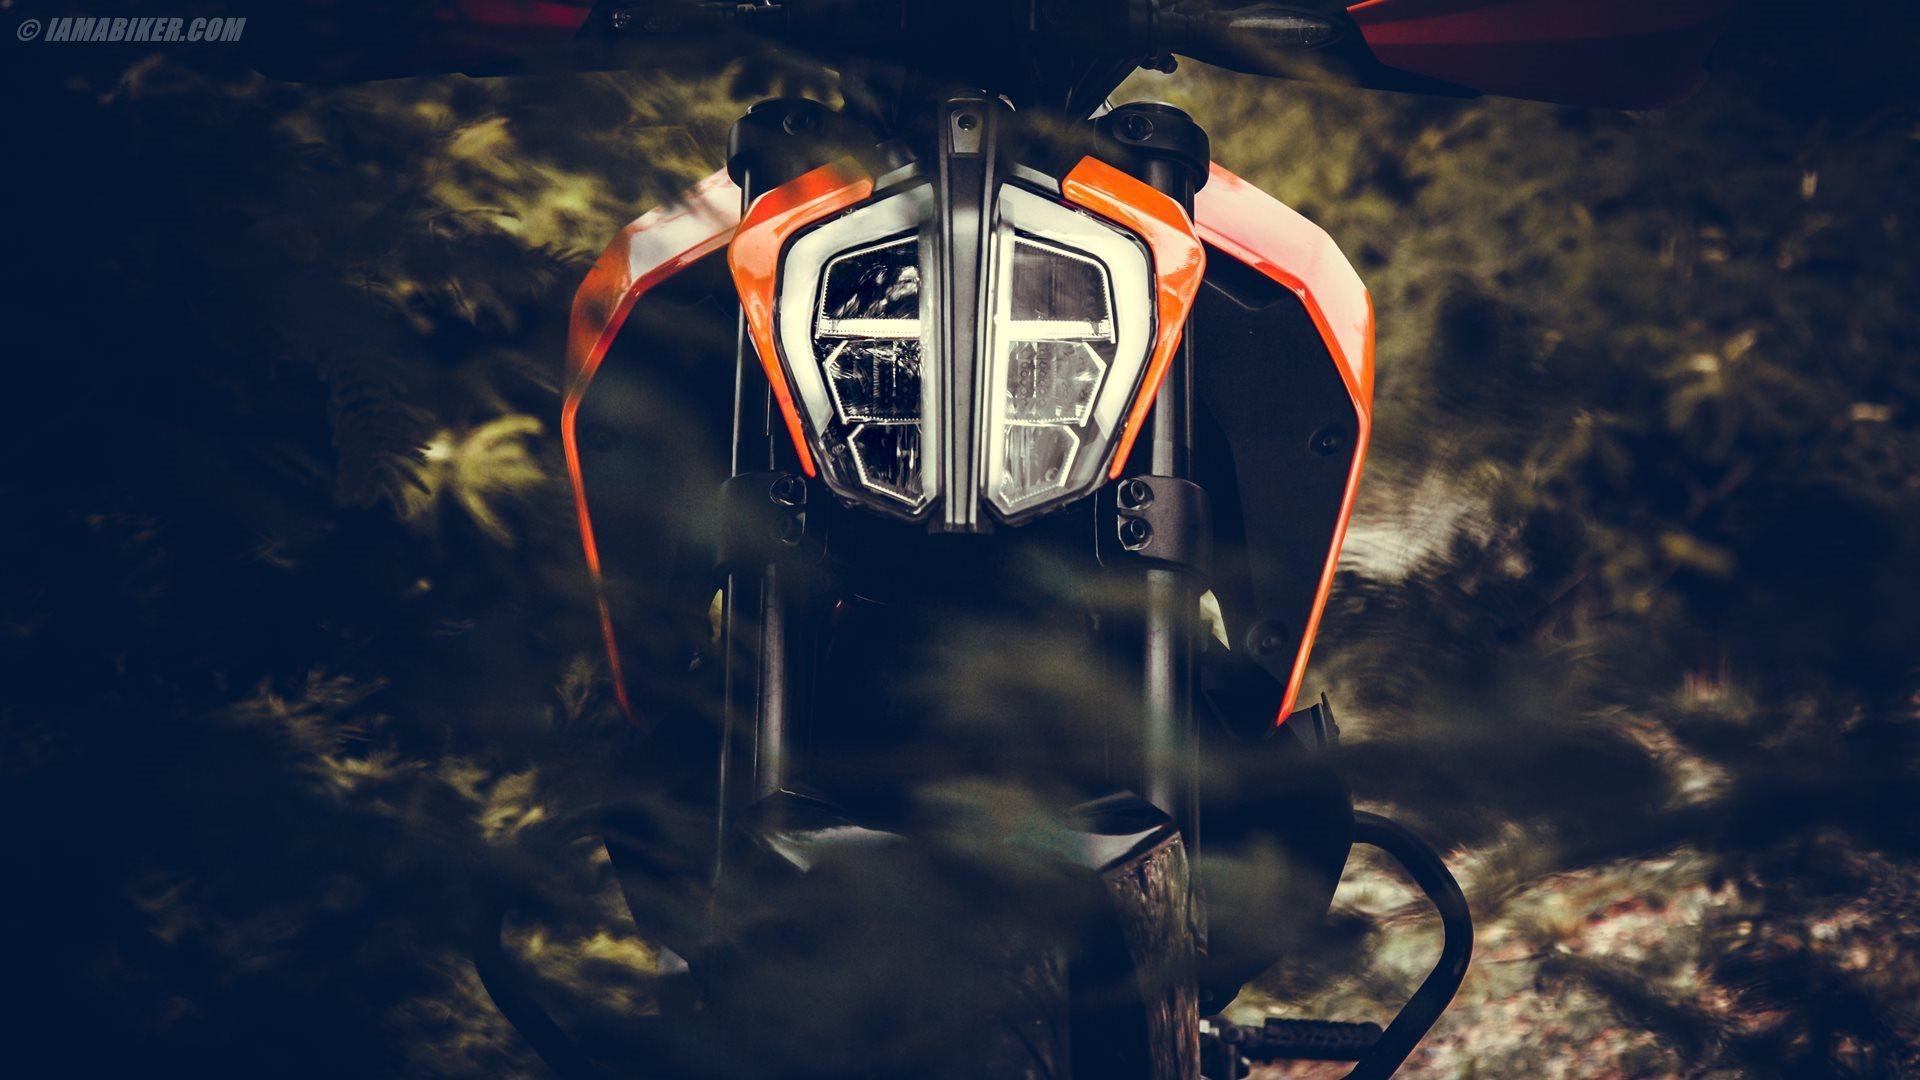 2017 KTM Duke 390 HD wallpapers IAMABIKER   Everything Motorcycle 1920x1080